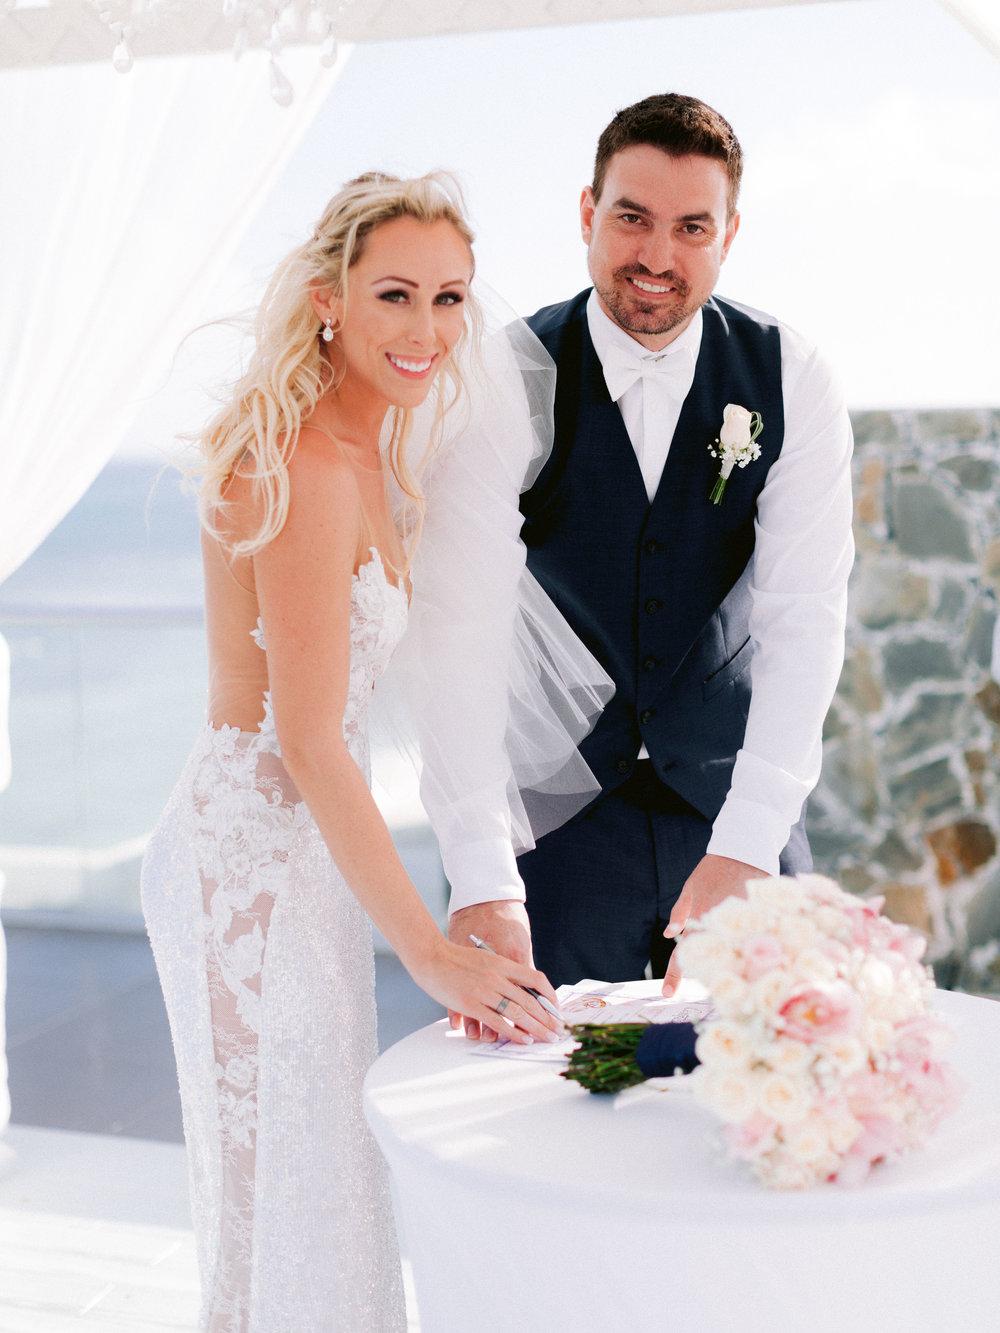 Kim_Jeff_Cancun Wedding_Ceremony_Kurtz_Orpia (87 of 119).jpg